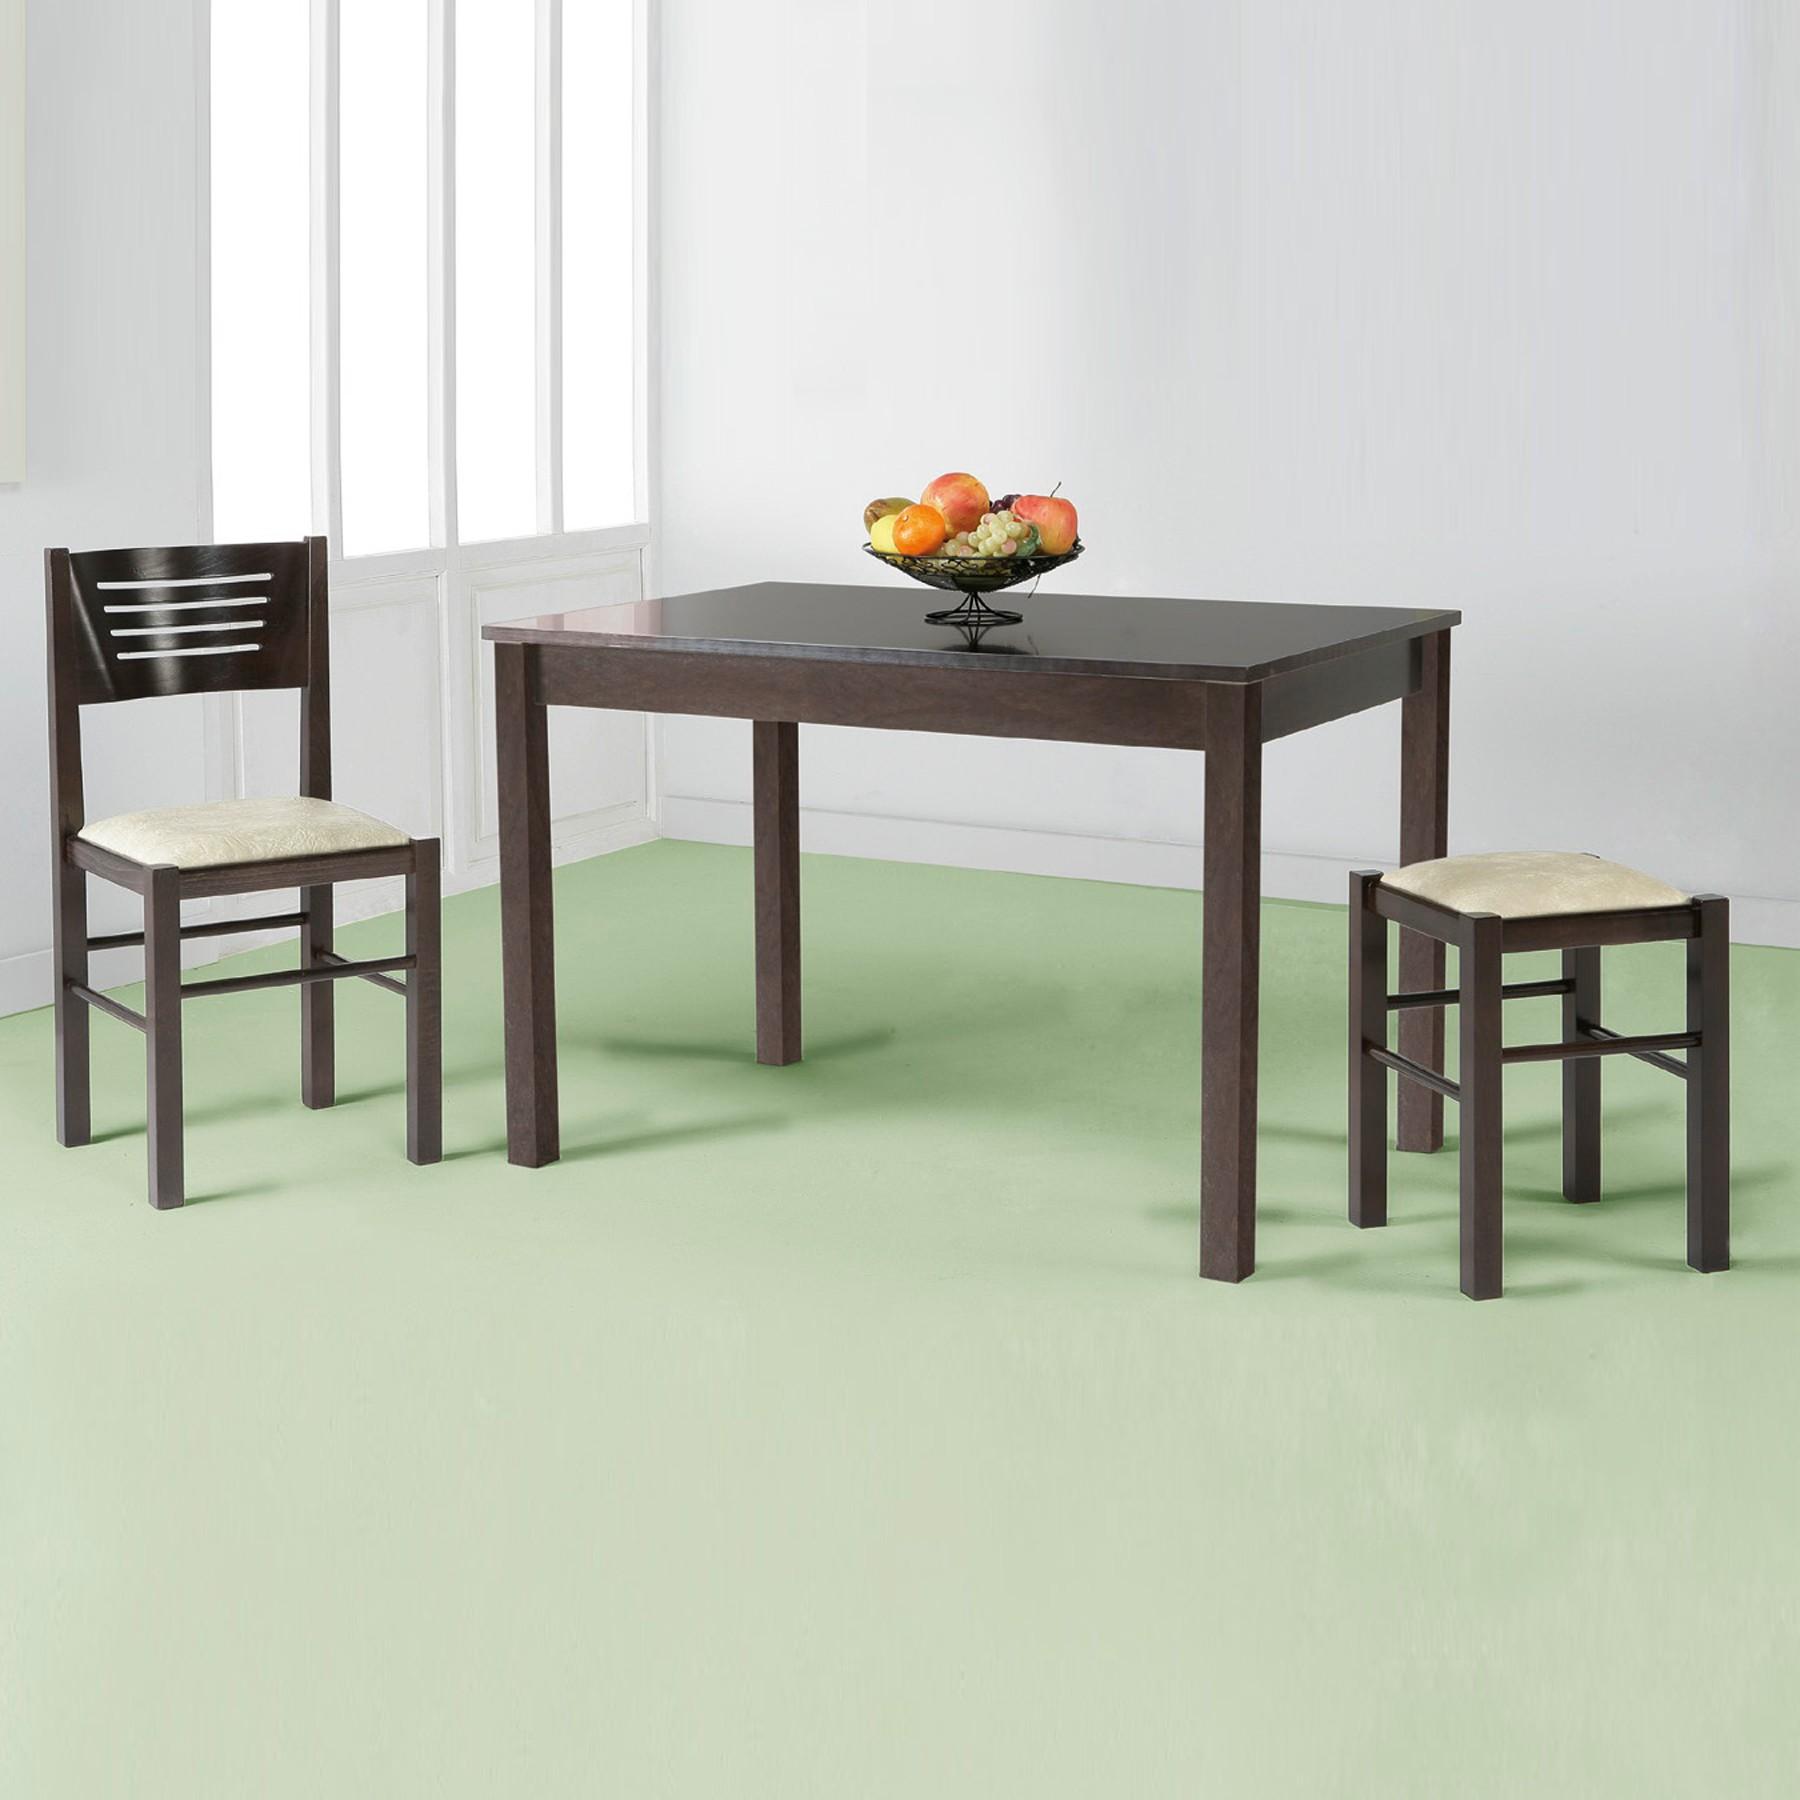 Mesa de cocina y comedor fija en madera modelo persimo - Mesa de madera para cocina ...